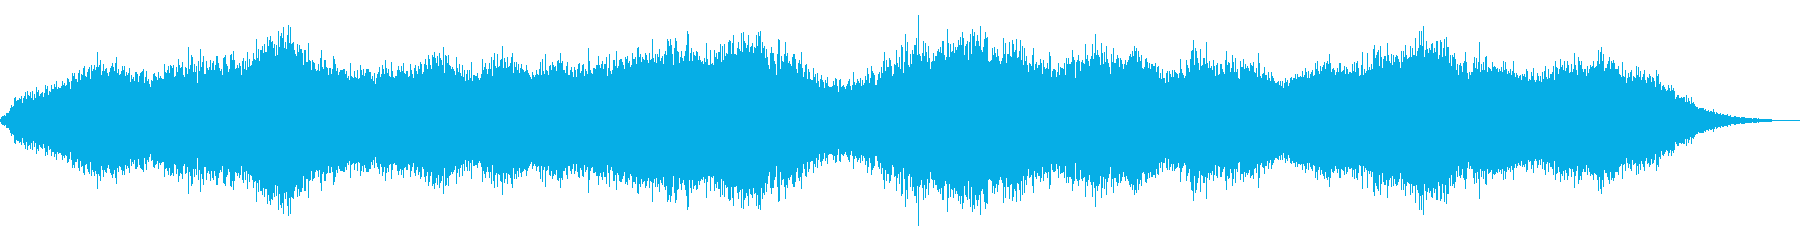 drone3の再生済みの波形